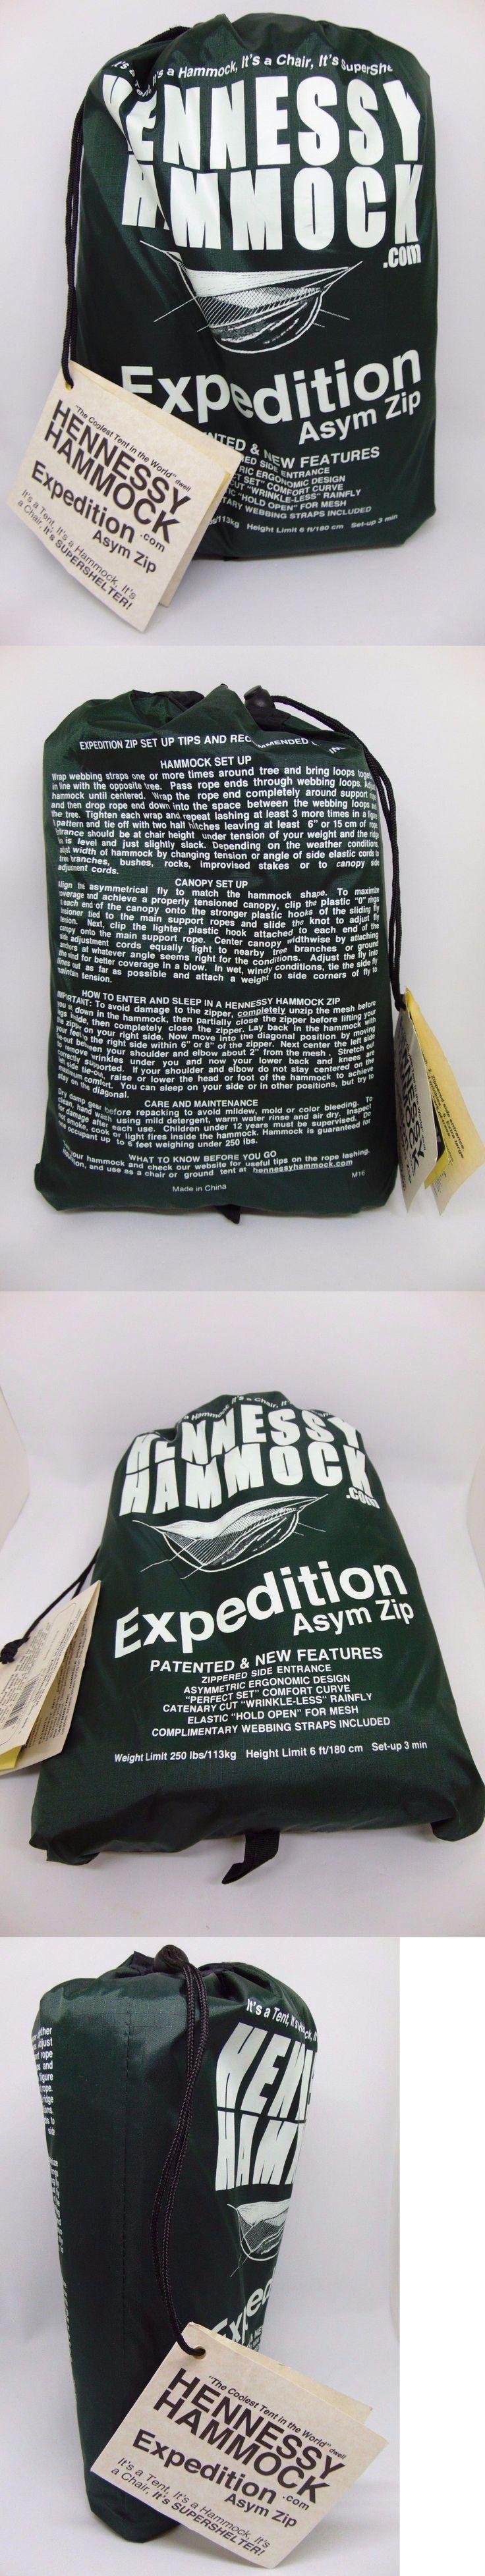 Hammocks 159030: Hennessy M-16 Expedition Asym Zip Camping Hammock New! -> BUY IT NOW ONLY: $143.2 on eBay!